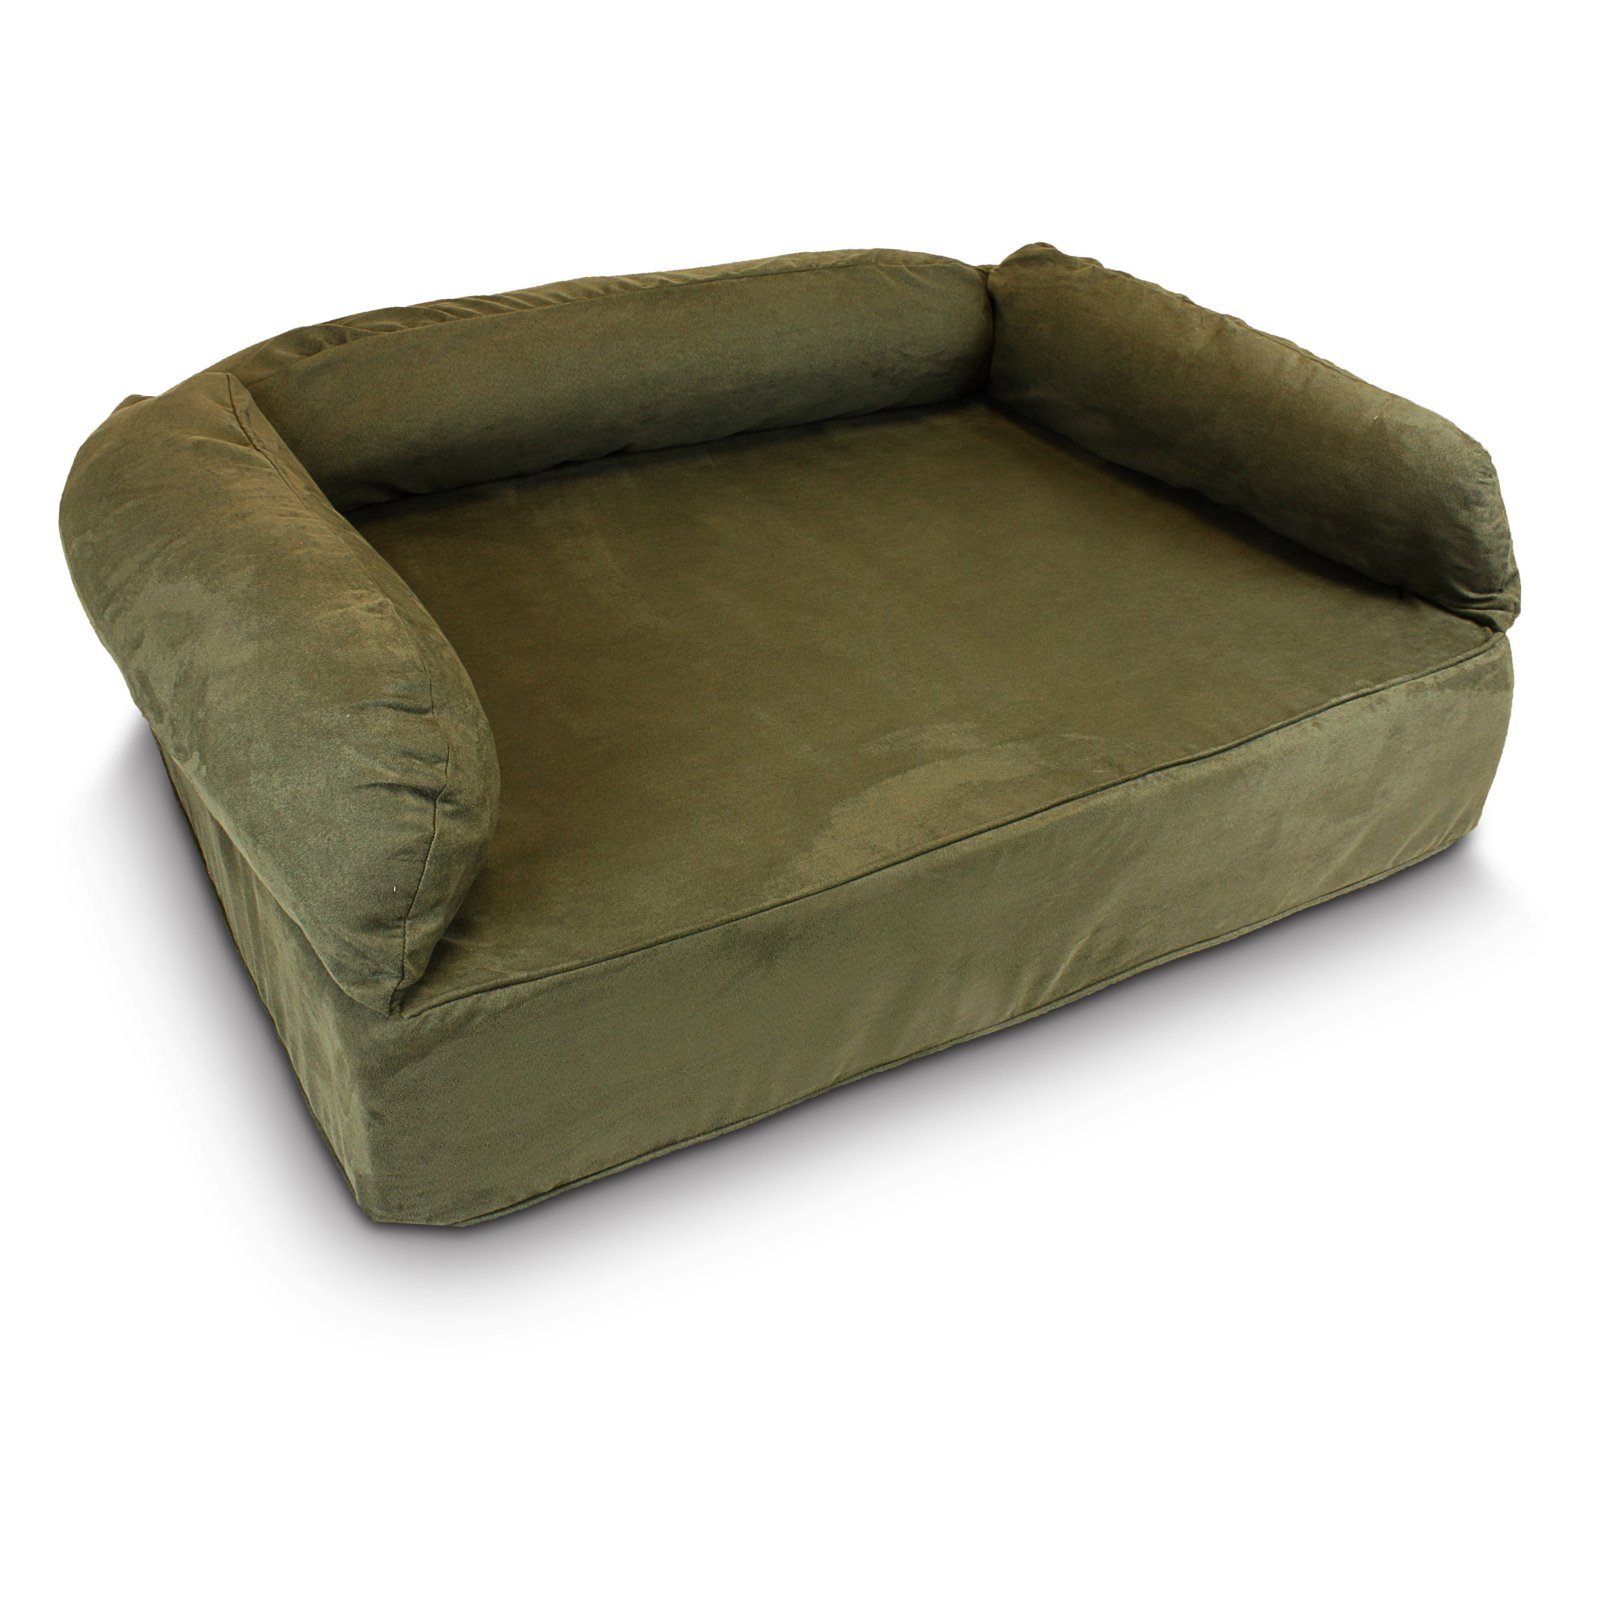 Snoozer Luxury Dog Sofa with Memory Foam